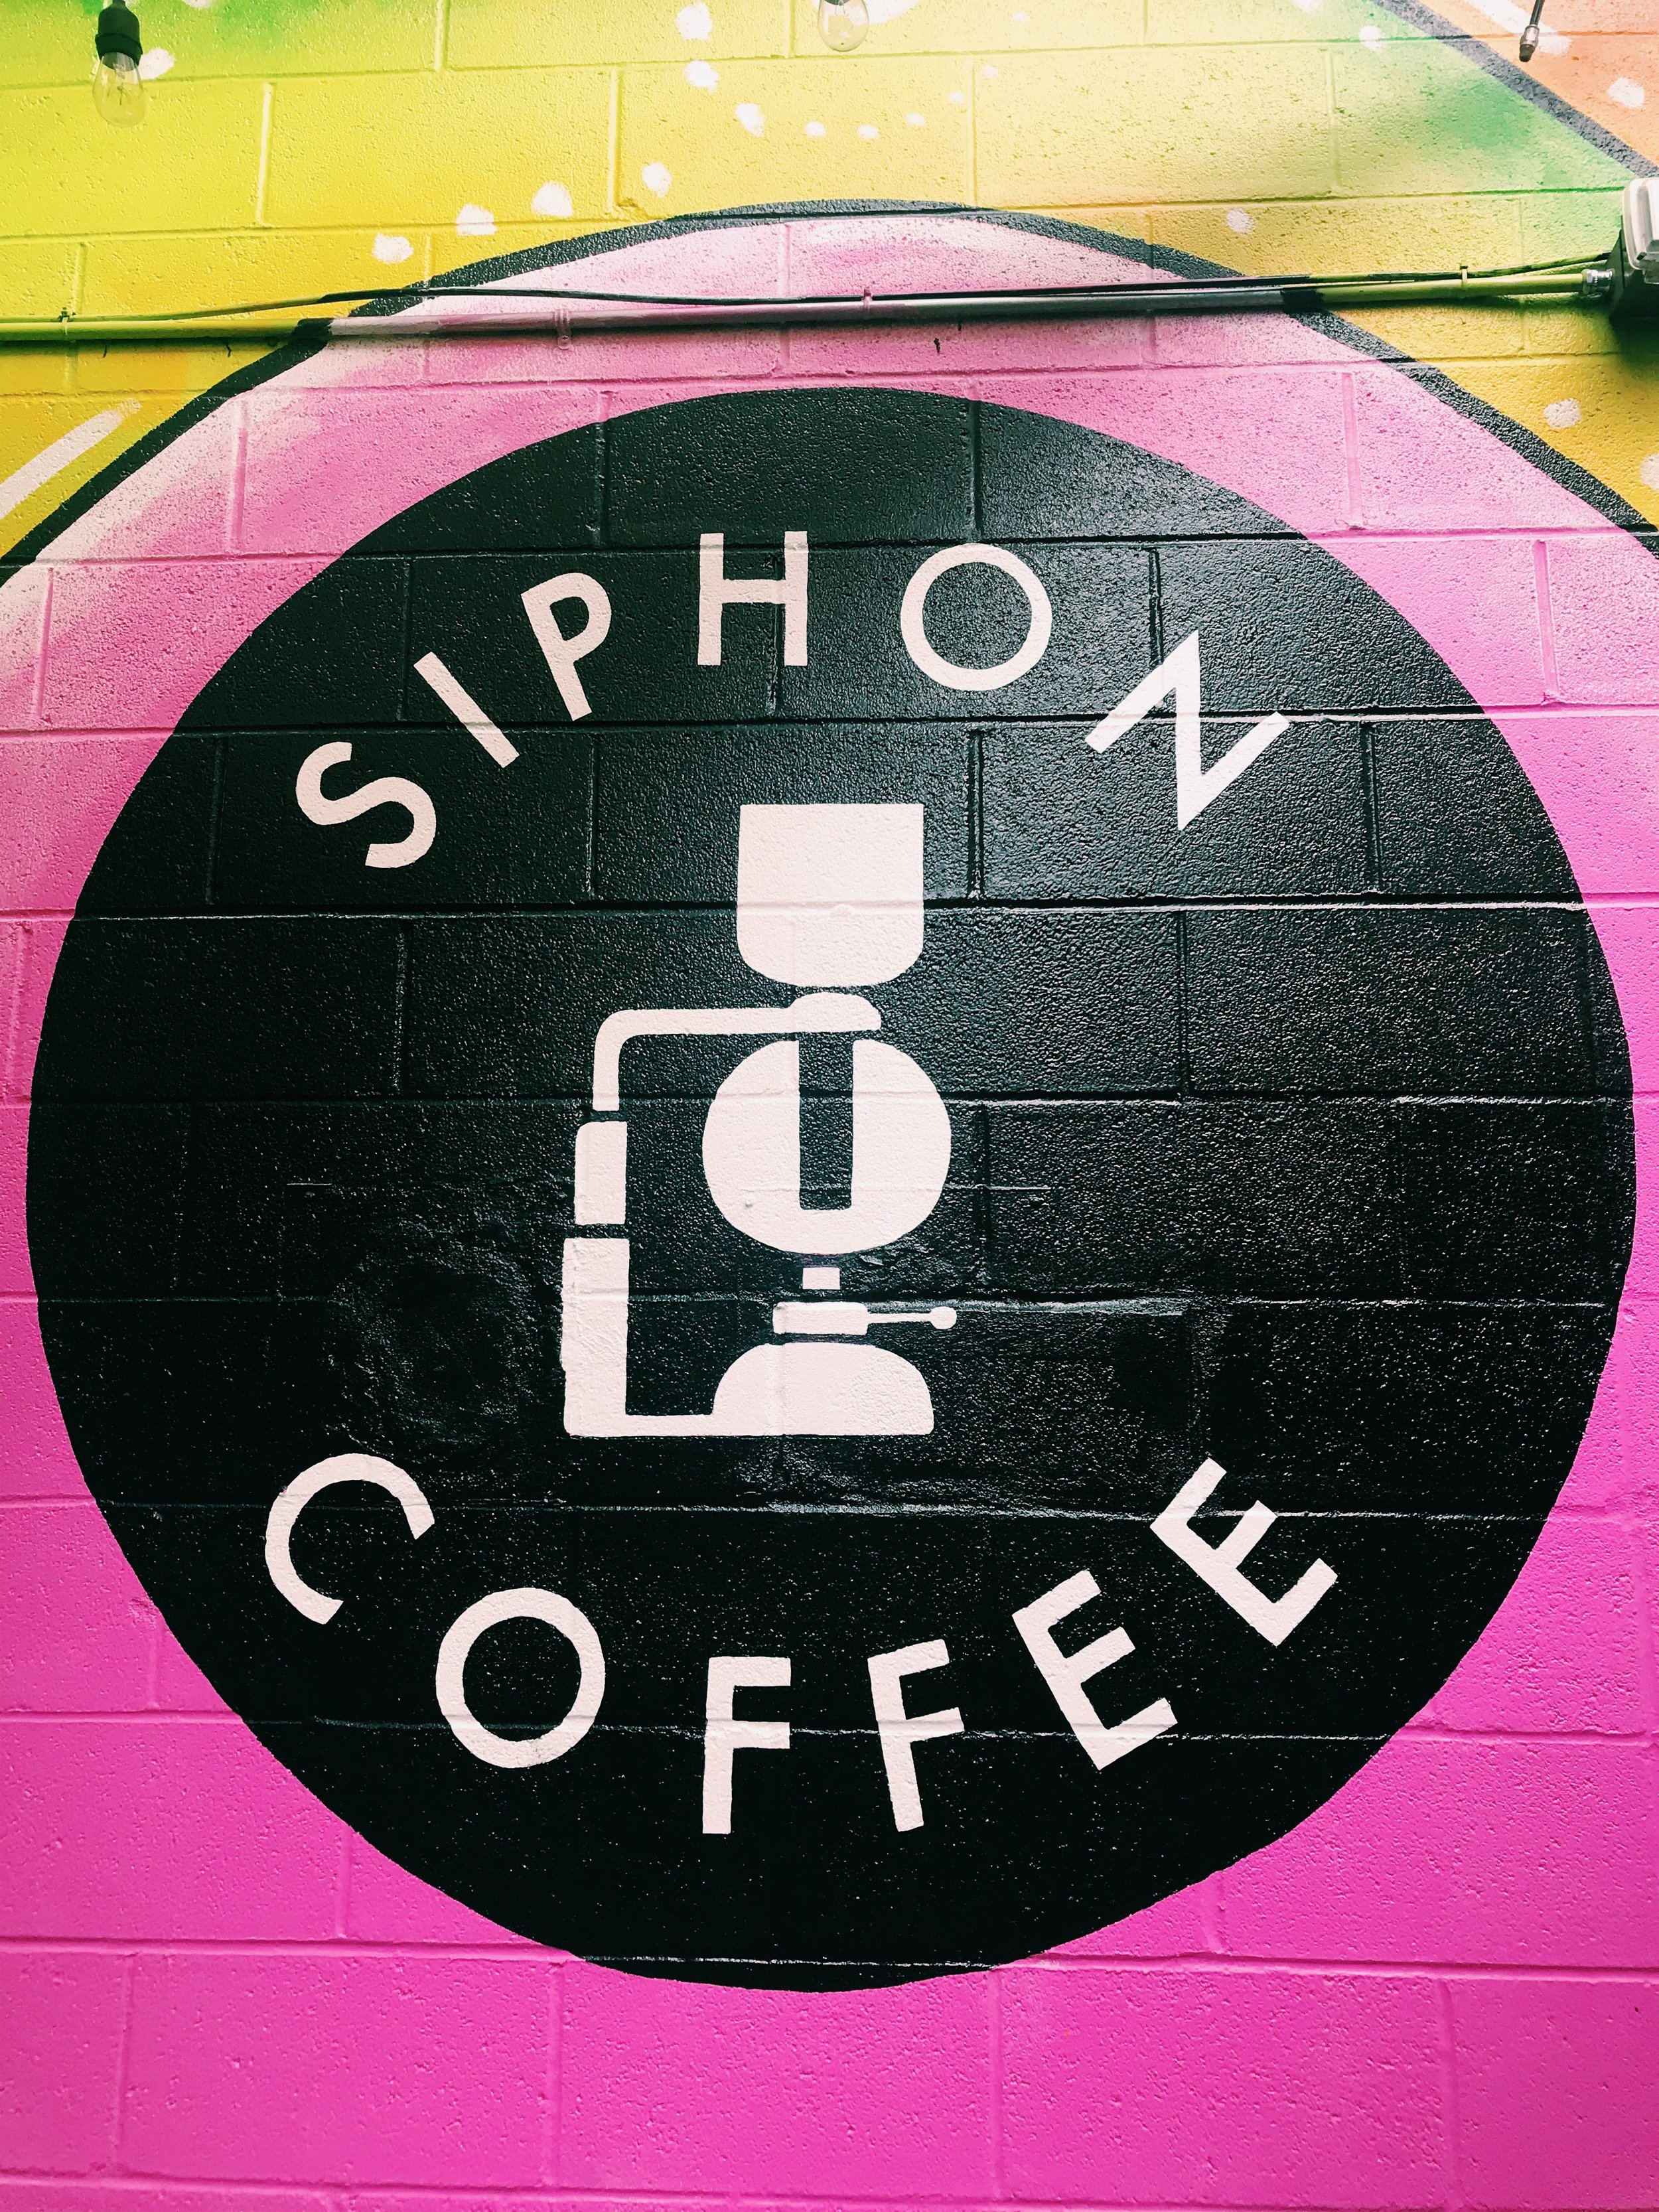 Three Heel Clicks - Siphon Coffee and Cozy Poncho - Houston Hotspots (9).jpg